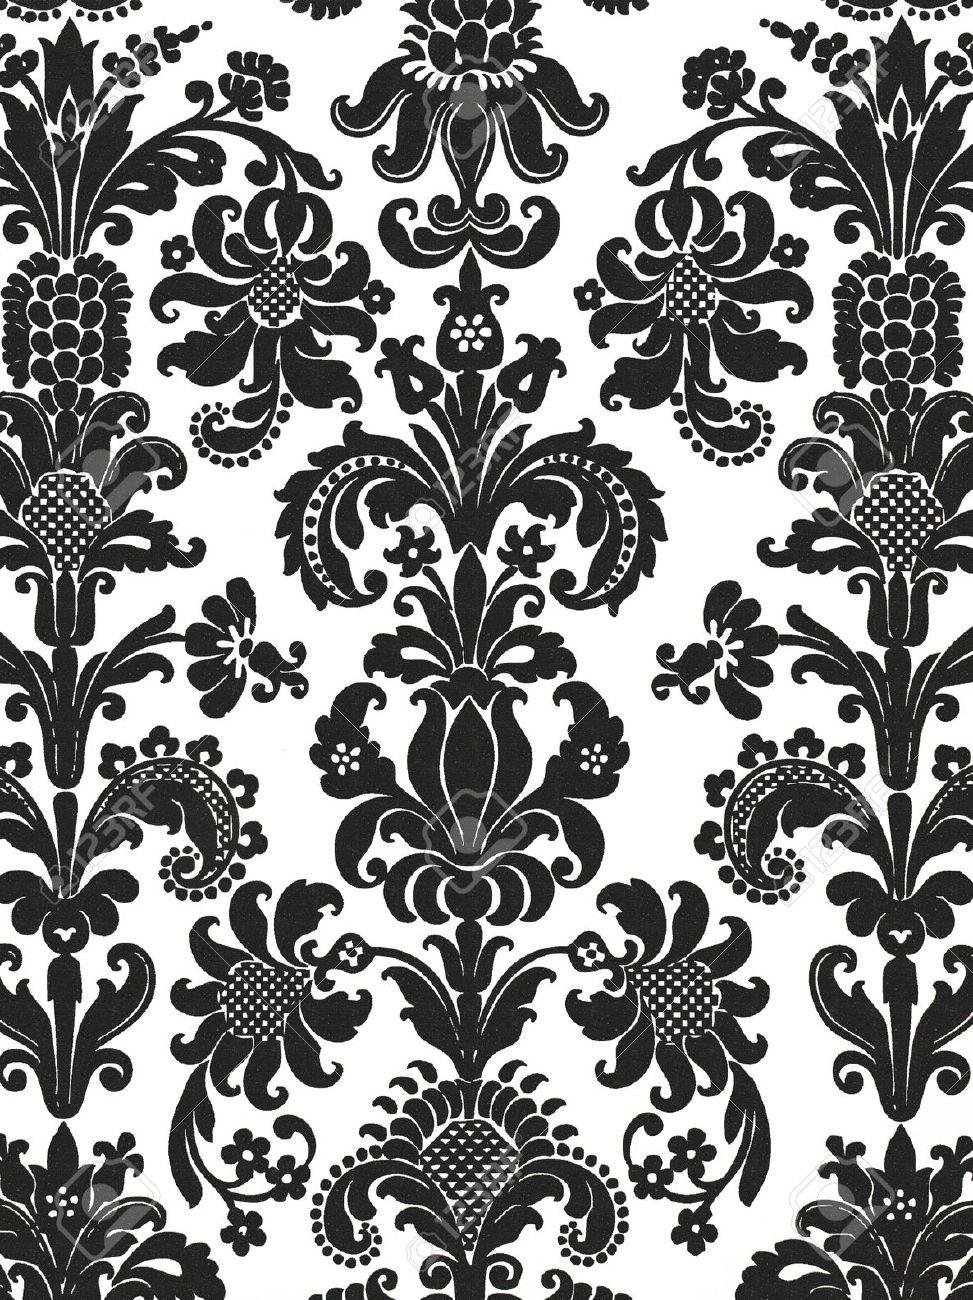 Carta Da Parati Floreale Bianco E Nero.Immagini Stock Carta Da Parati In Bianco E Nero Senza Soluzione